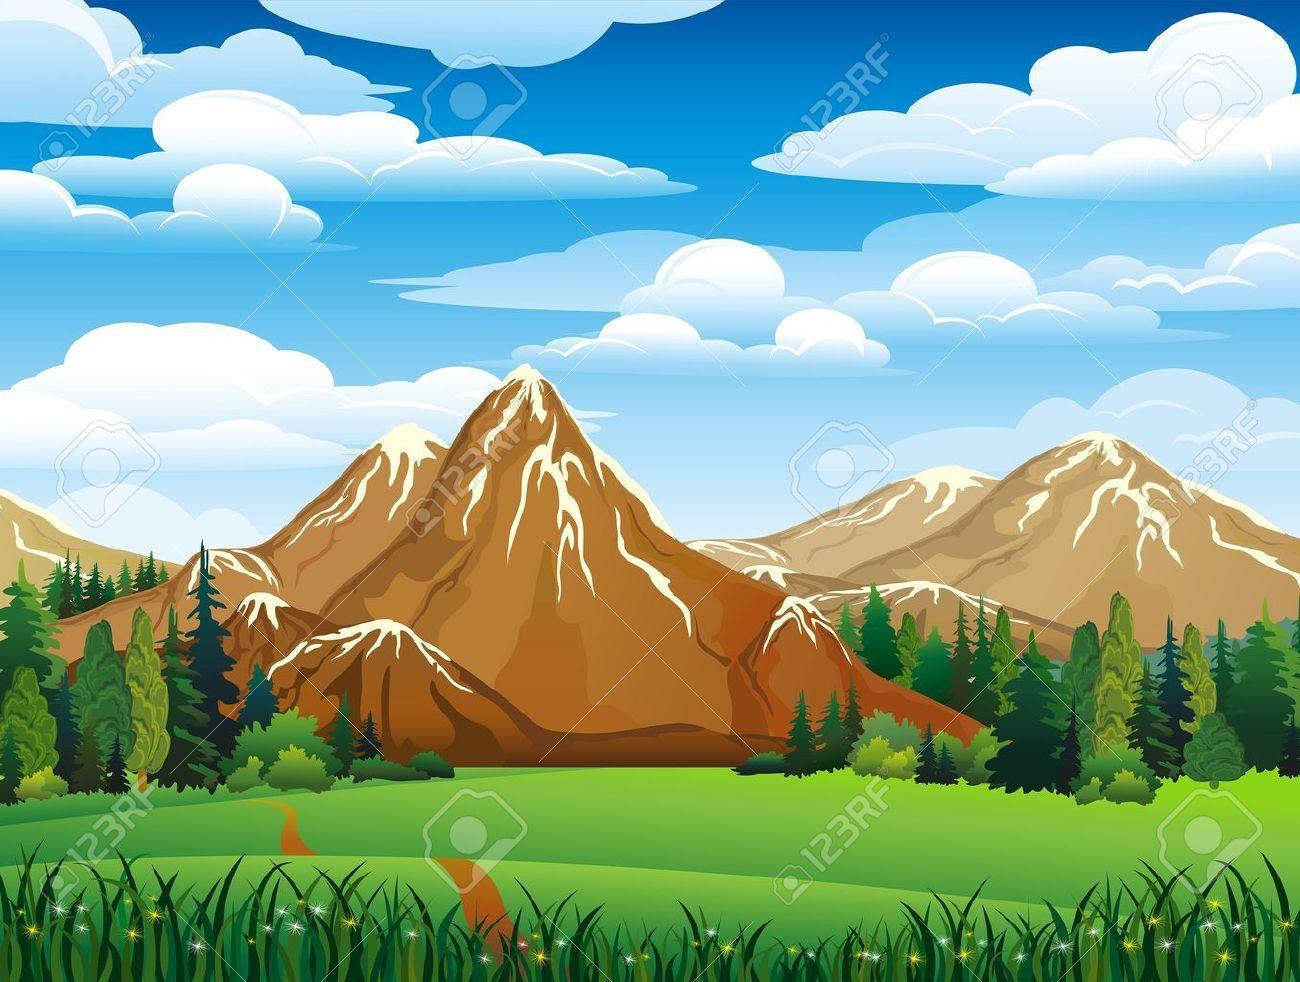 Mountains background clipart 3 » Clipart Portal.